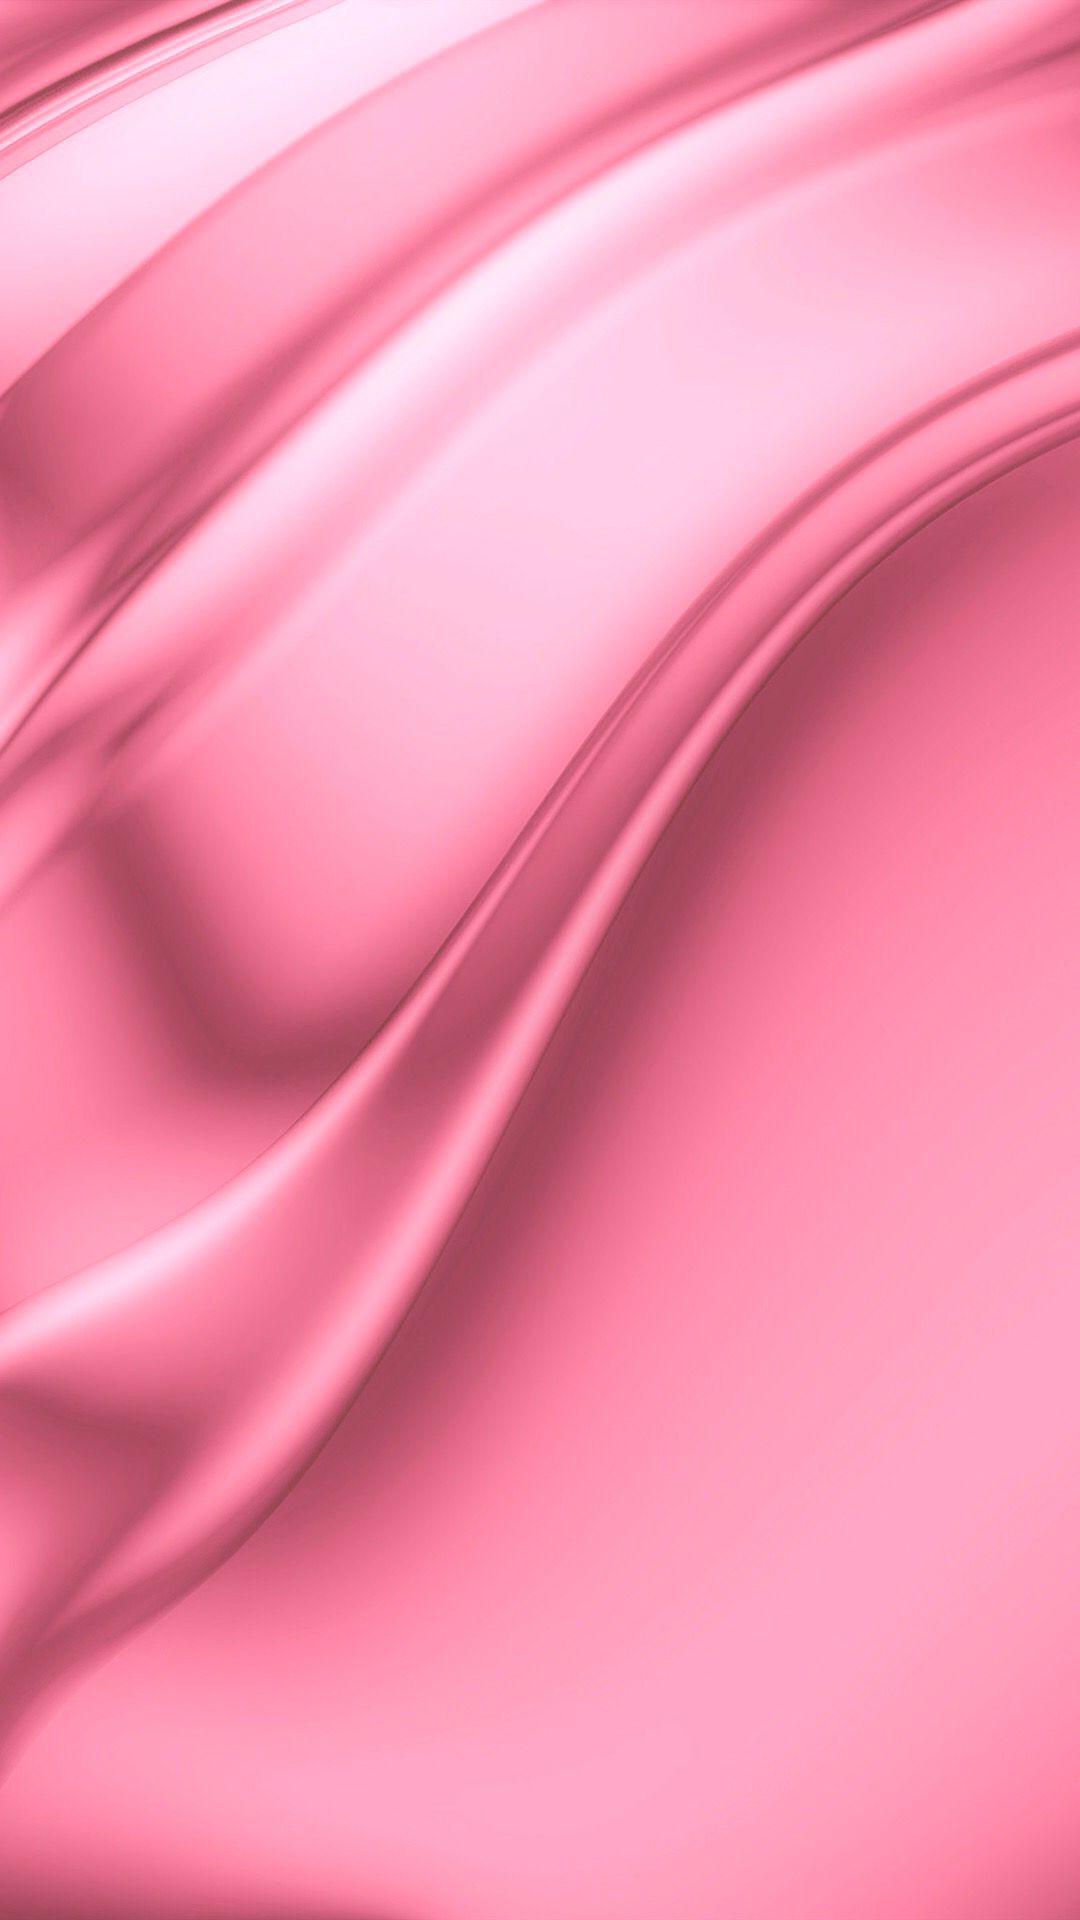 Pink Glossy Wallpaper Pink Wallpaper Cute Pastel Wallpaper Huawei Wallpapers